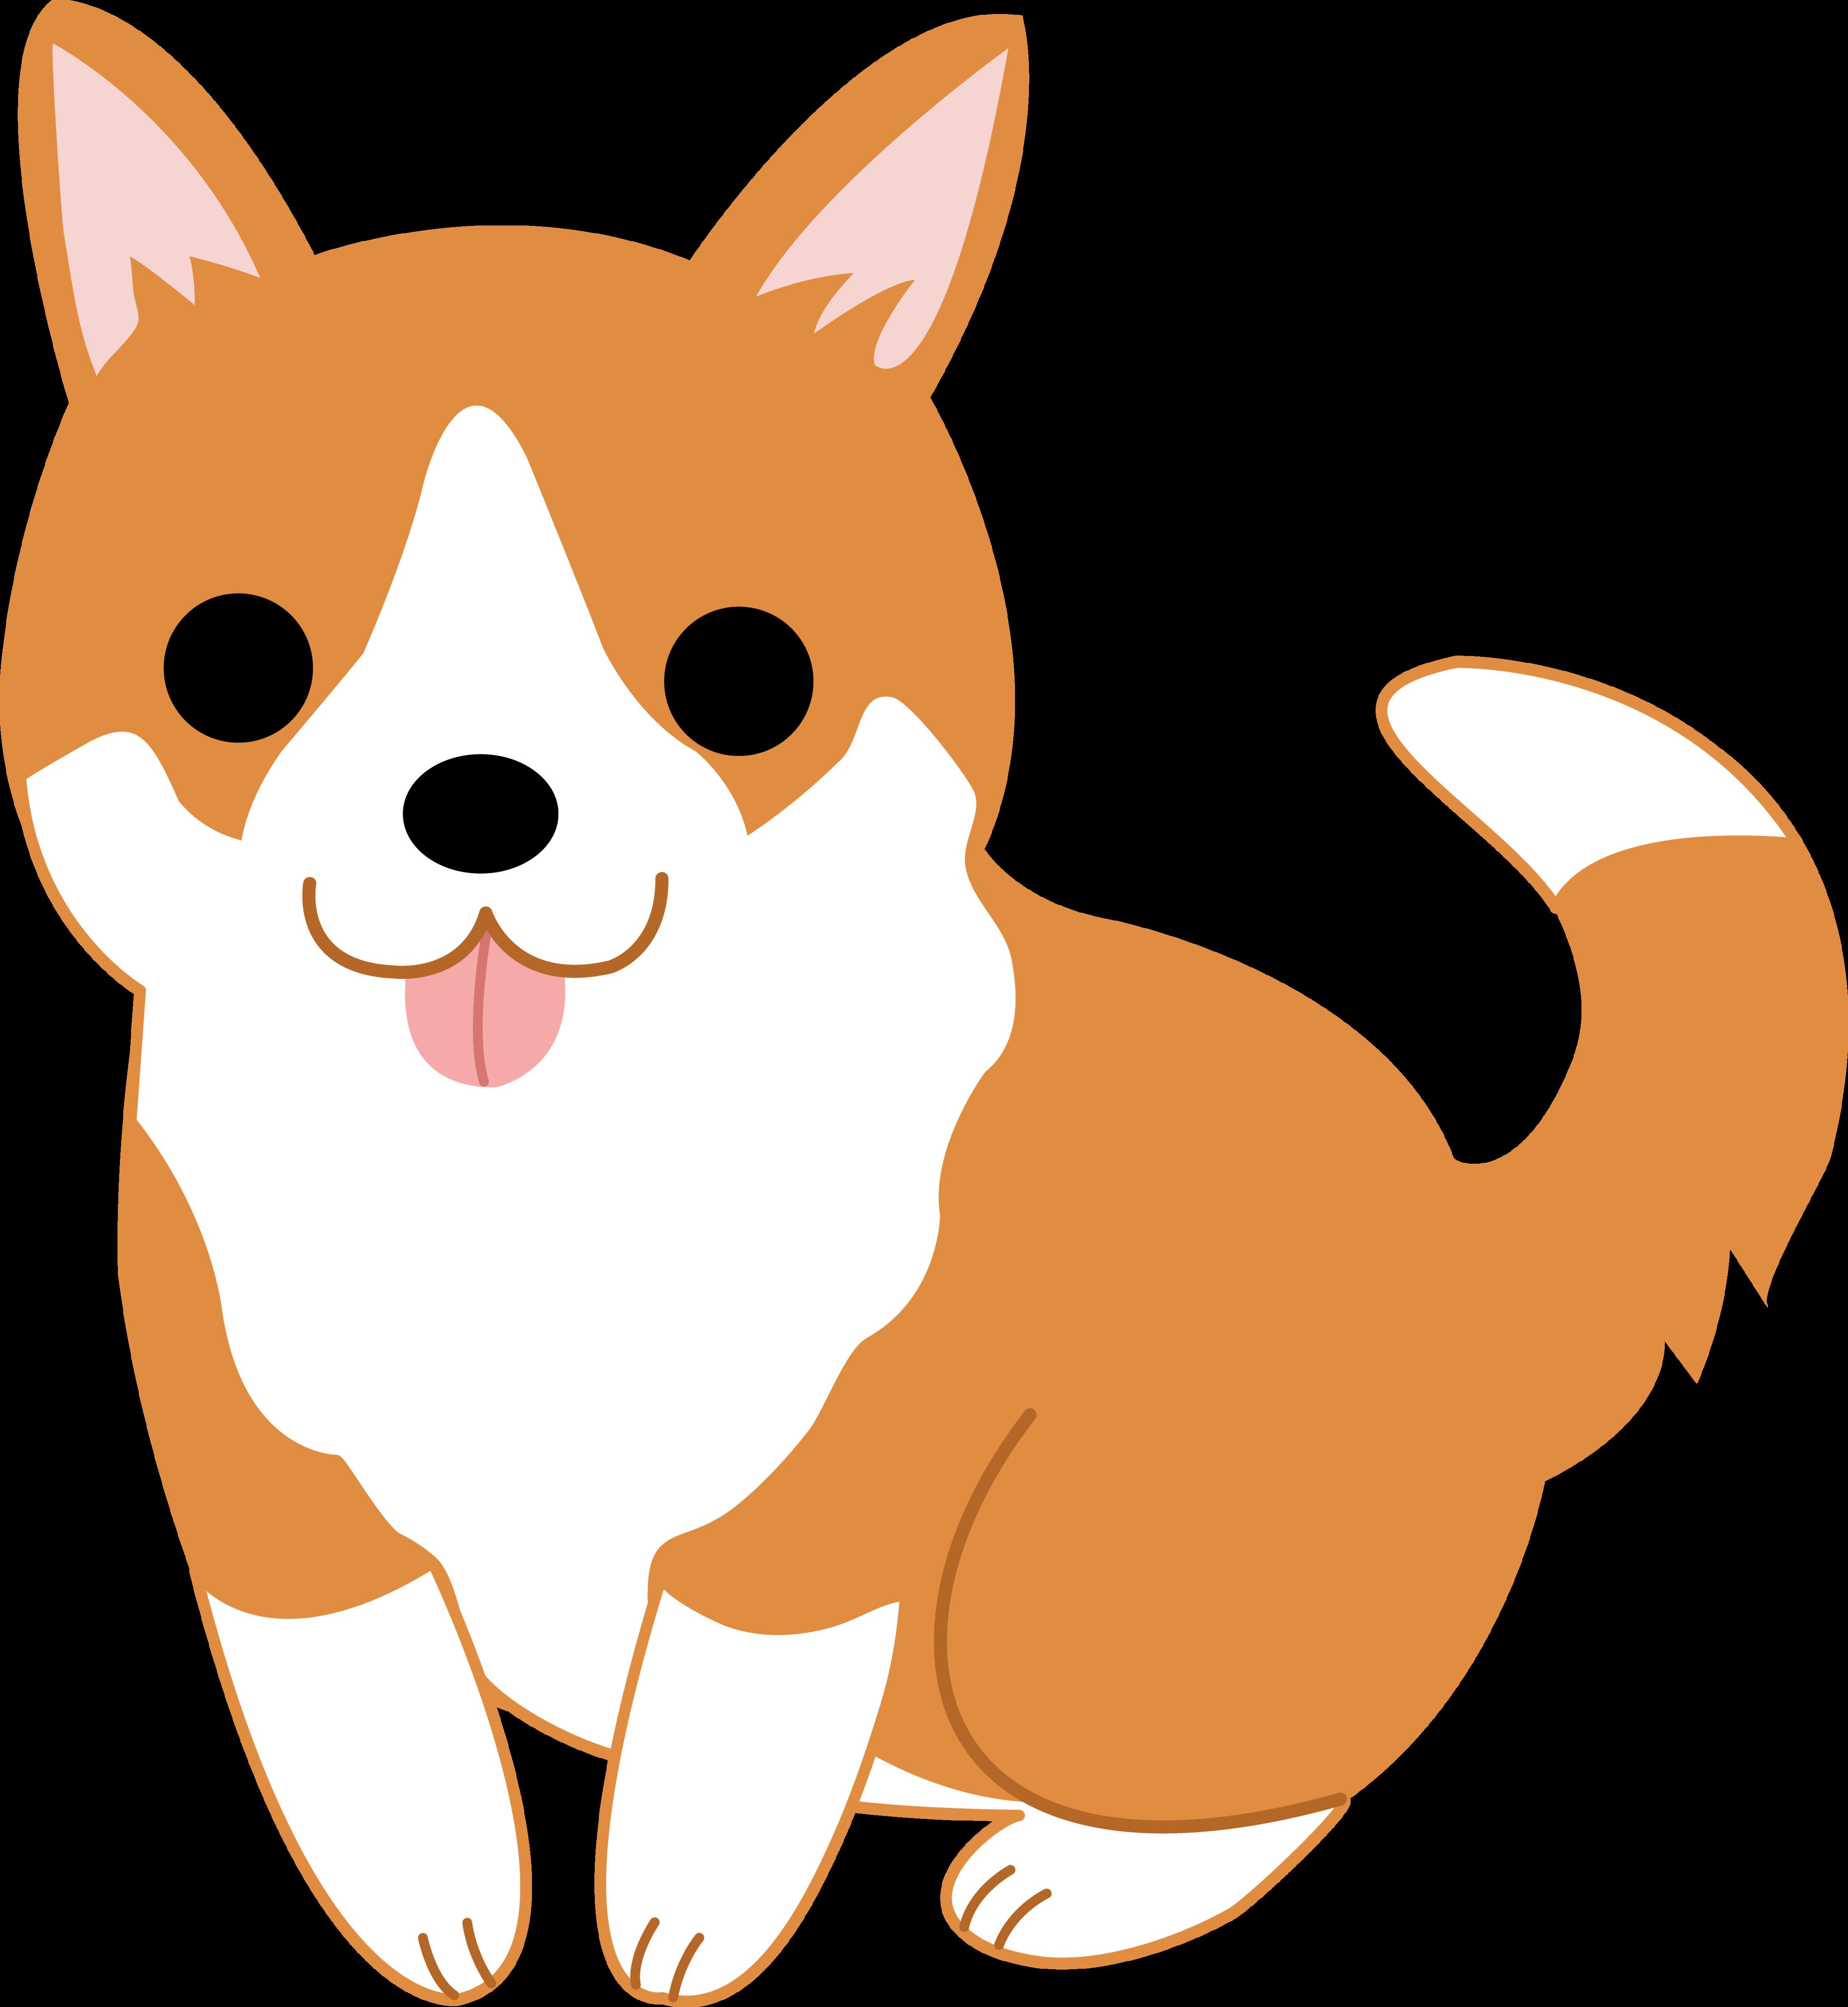 Clipart puppy animated, Clipart puppy animated Transparent.